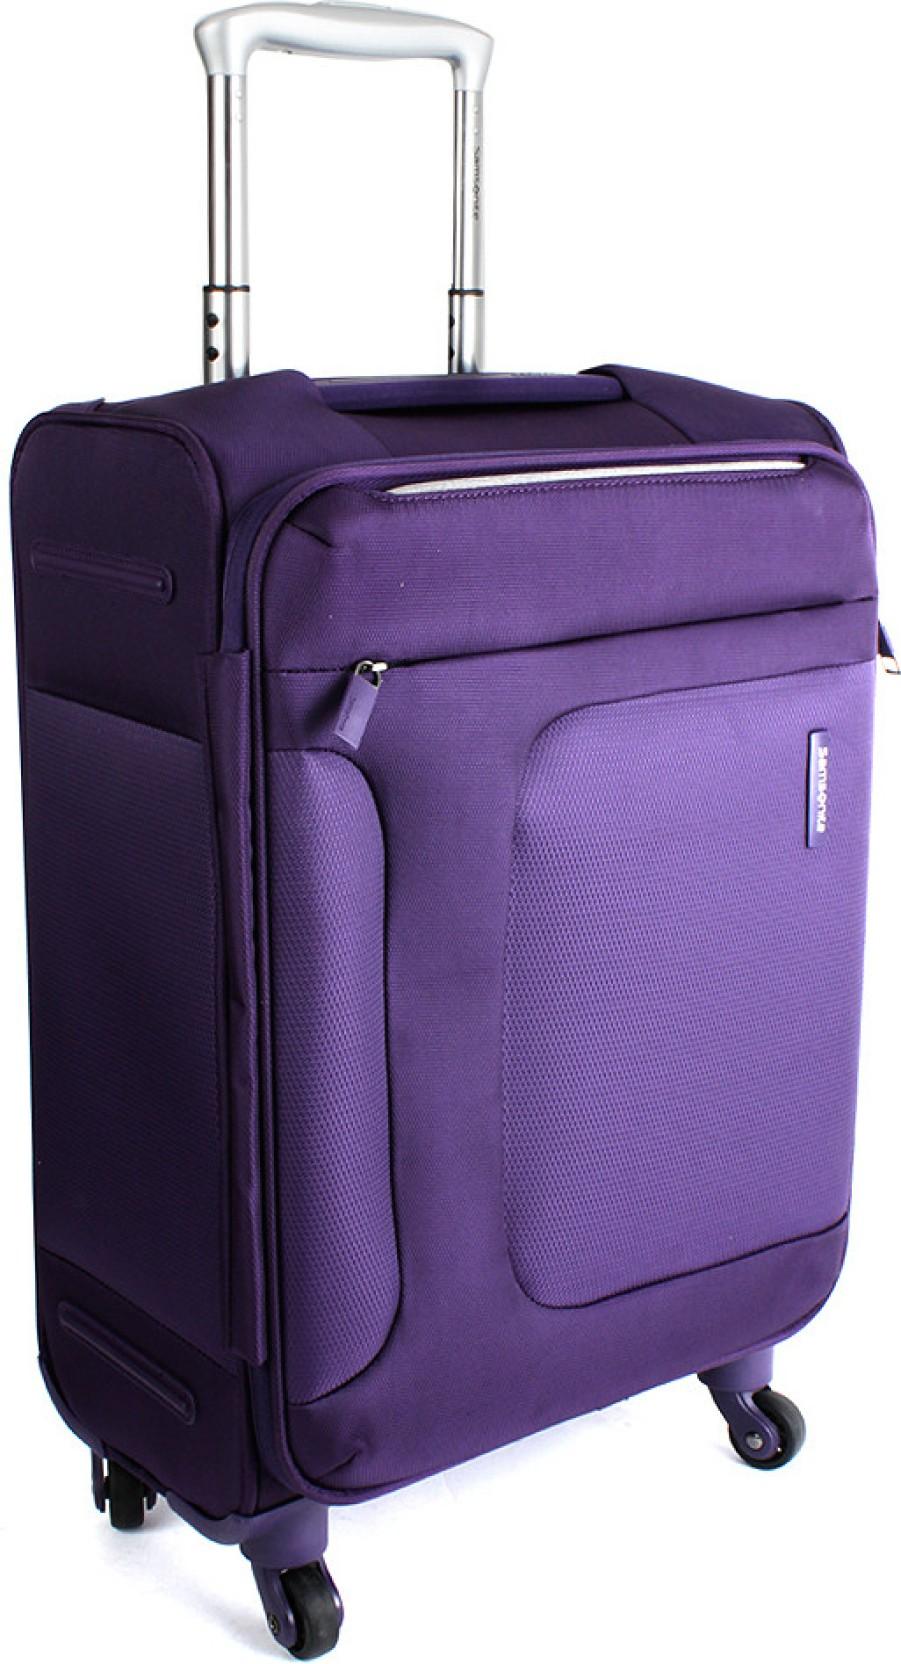 Samsonite asphere cabin luggage 18 inches purple price for Samsonite cabin luggage